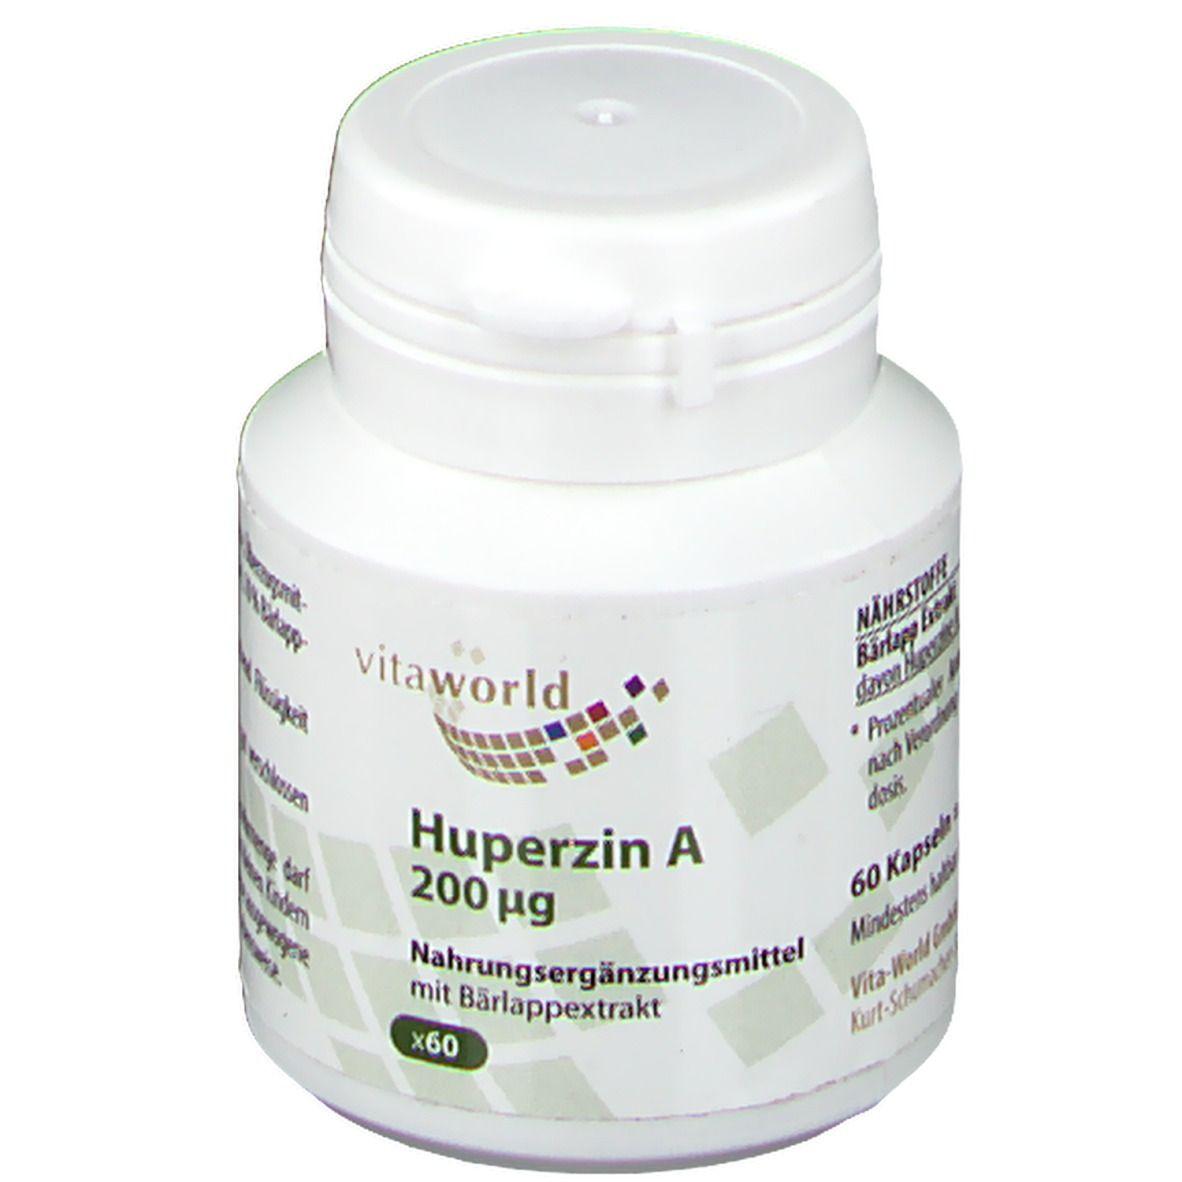 VitaWorld Huperzin A 200 µg